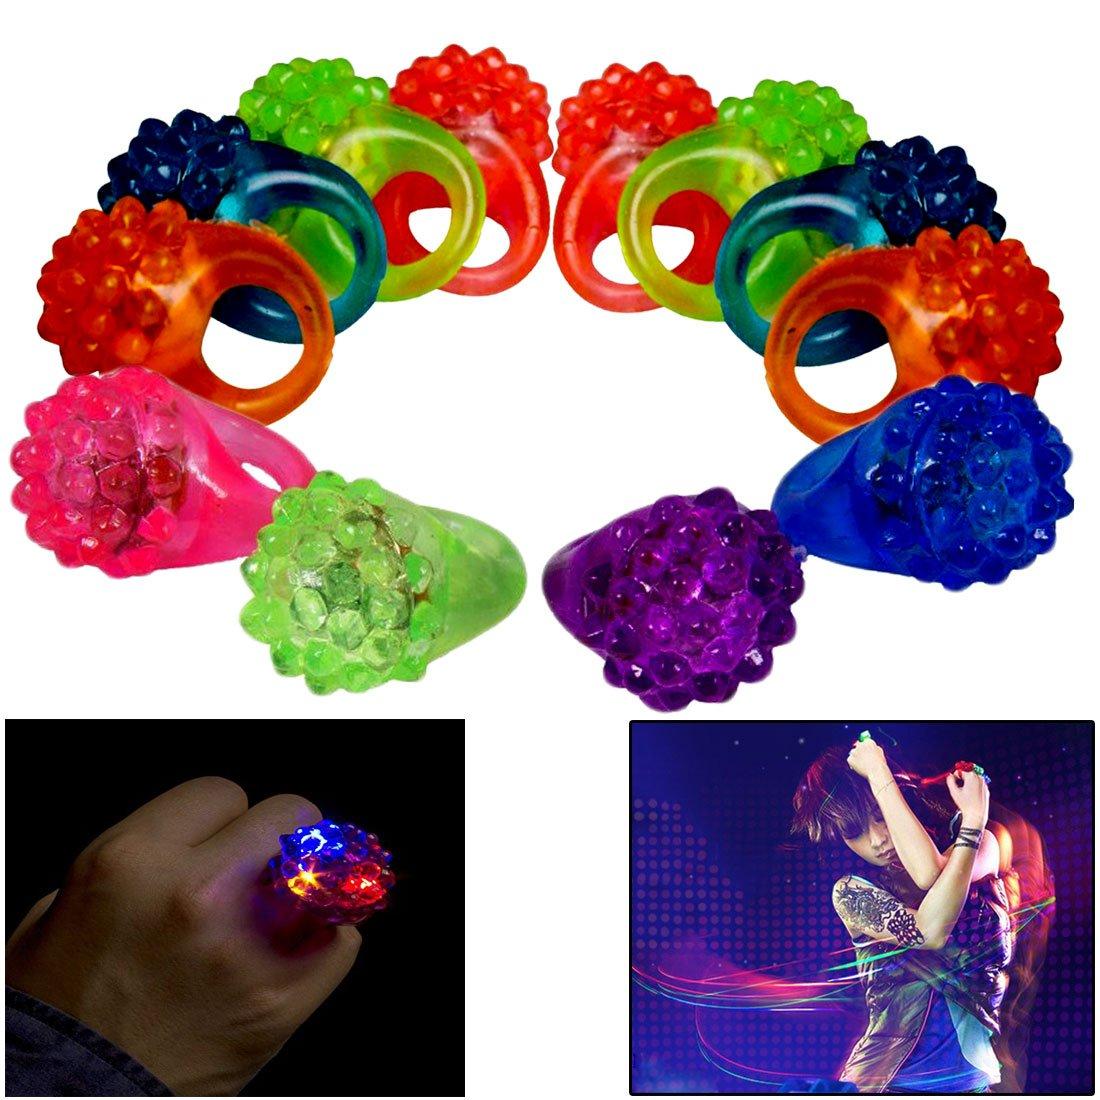 Dazzling Toys Light Up Rings | 24 Pack Flashing LED Light Up Toys, Bumpy Rings, 2 Dozen by Dazzling Toys